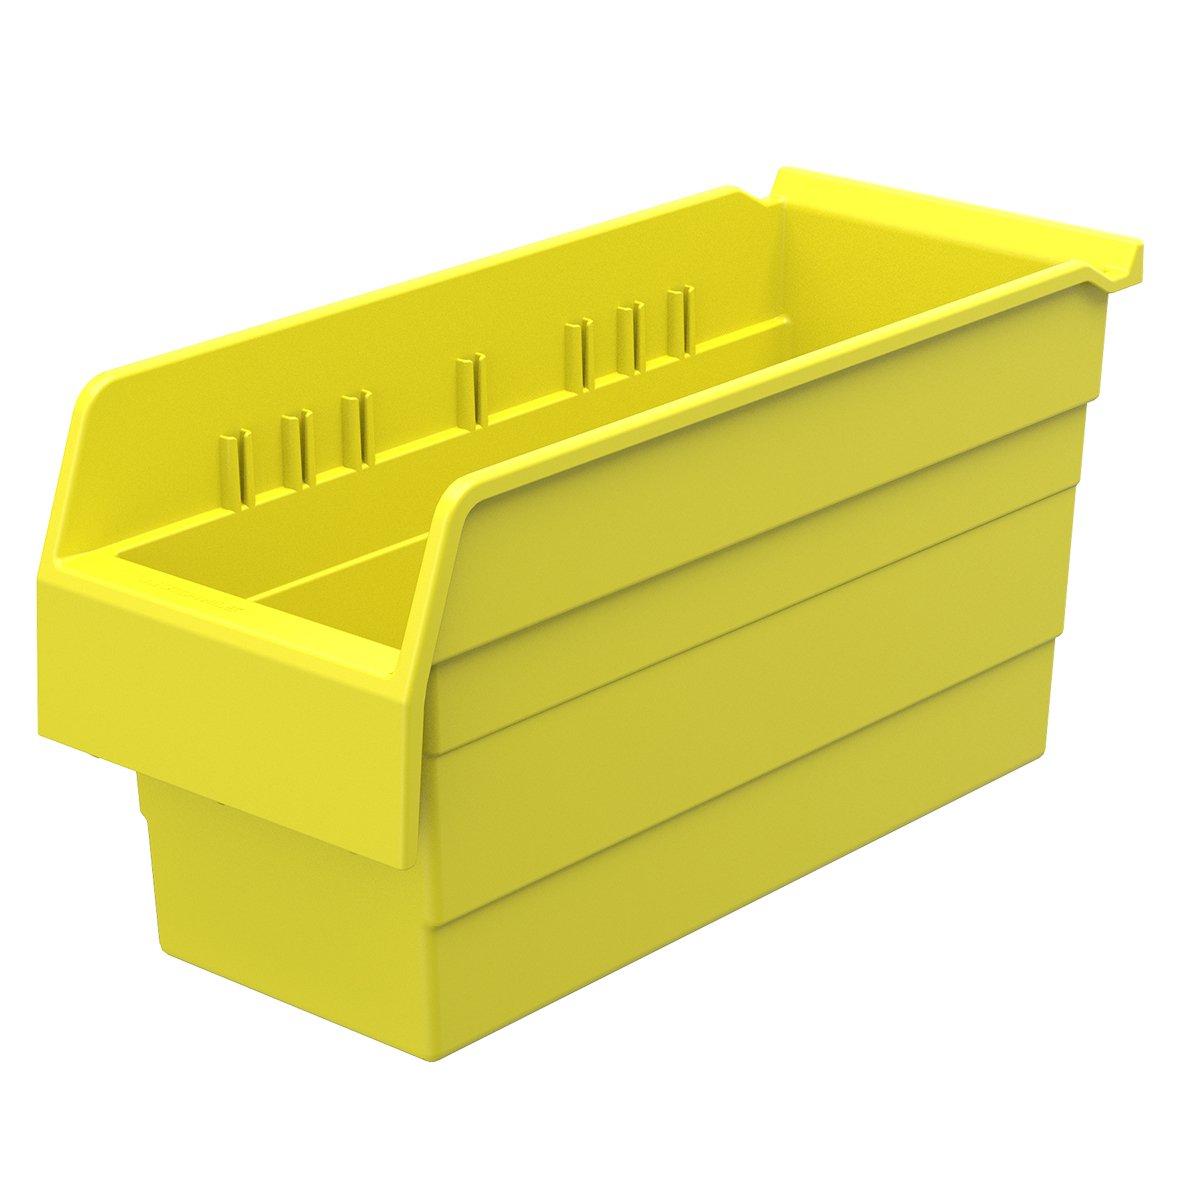 Akro-Mils 30866 ShelfMax 8 Plastic Nesting Shelf Bin Box, 16-Inch x 6-Inch x 8-Inch, Yellow, 10-Pack